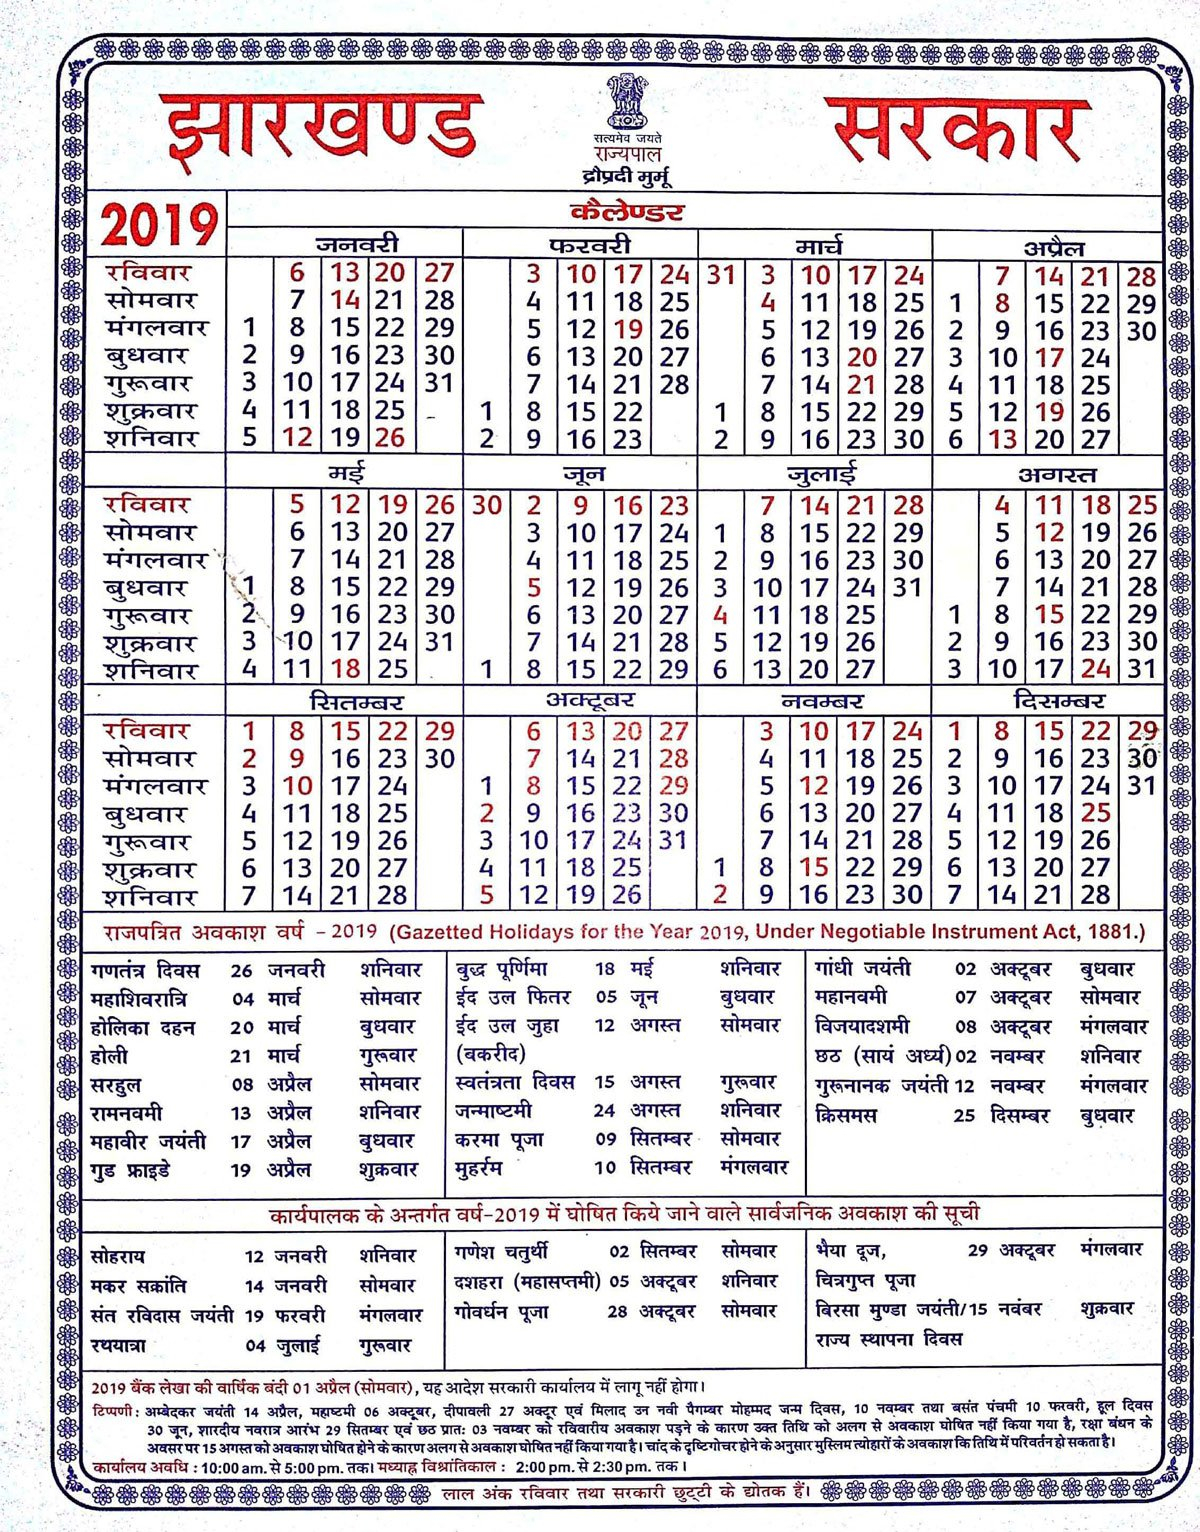 Jharkhand-Govt-Calendar - Free Business Listing, Free Business Calendar 2019 Government Holidays